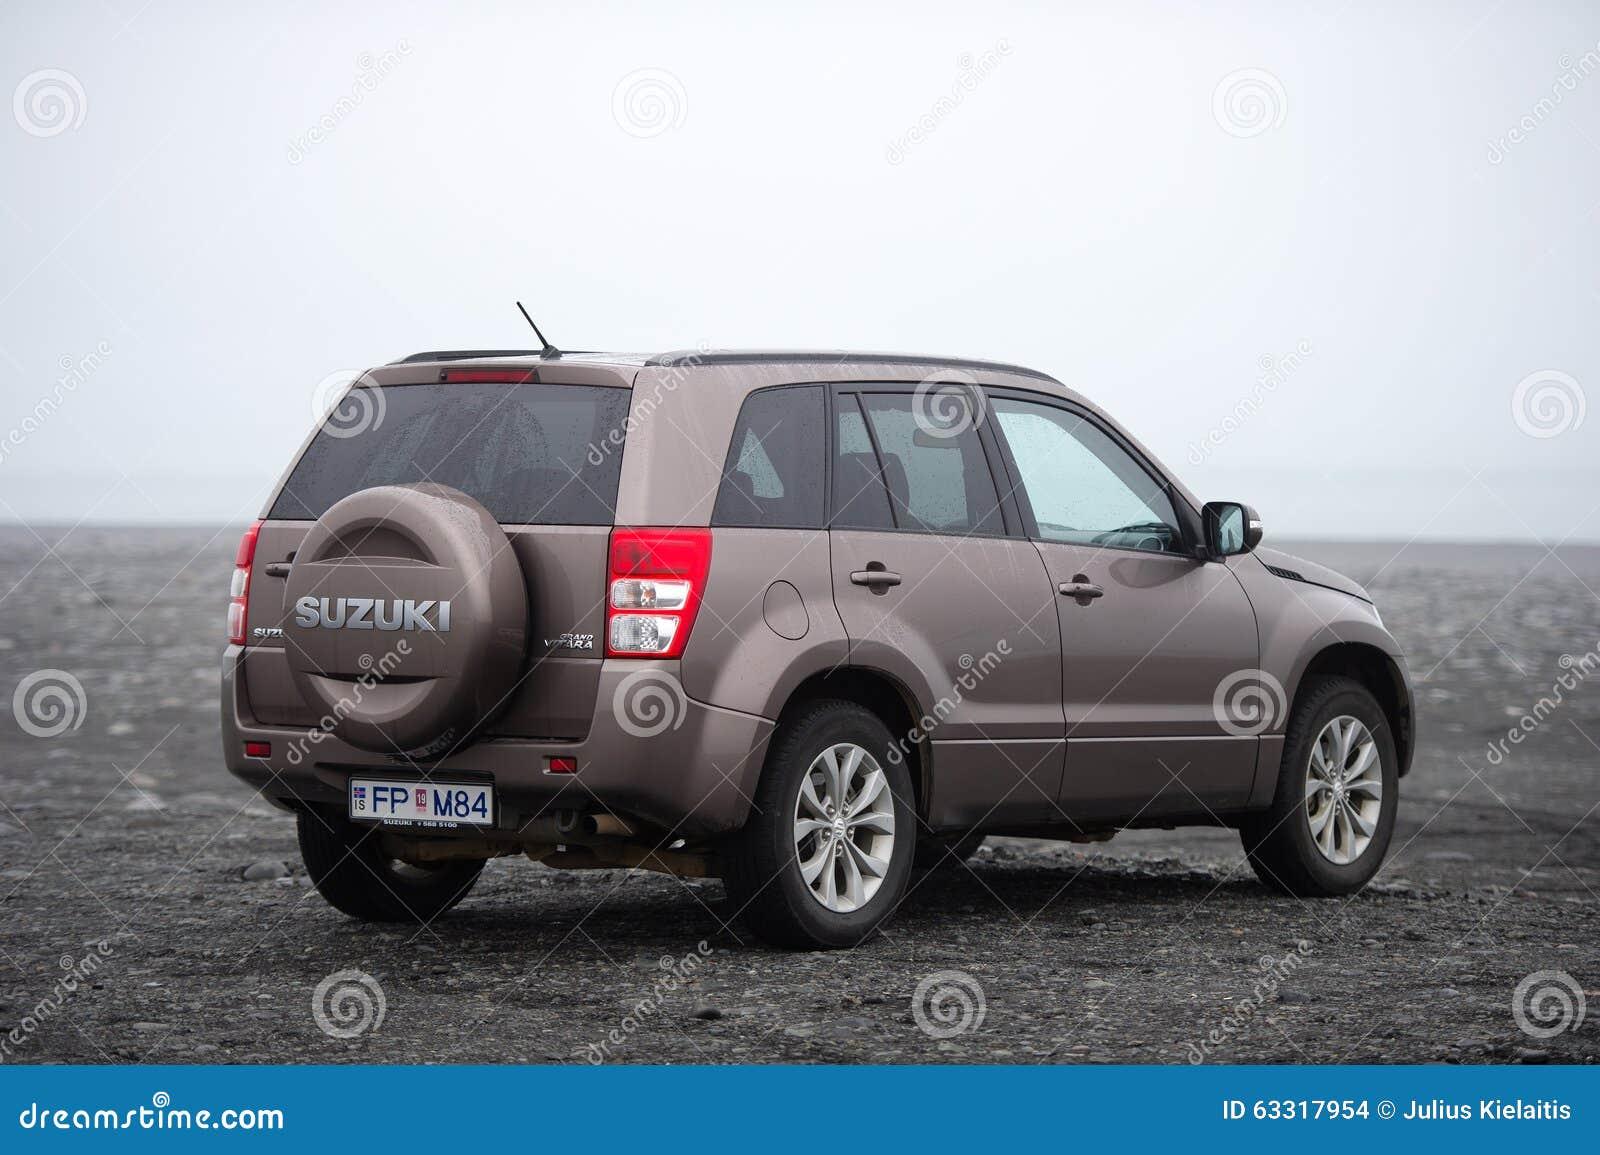 Suzuki Grand Vitara Suv Car Editorial Stock Image Image